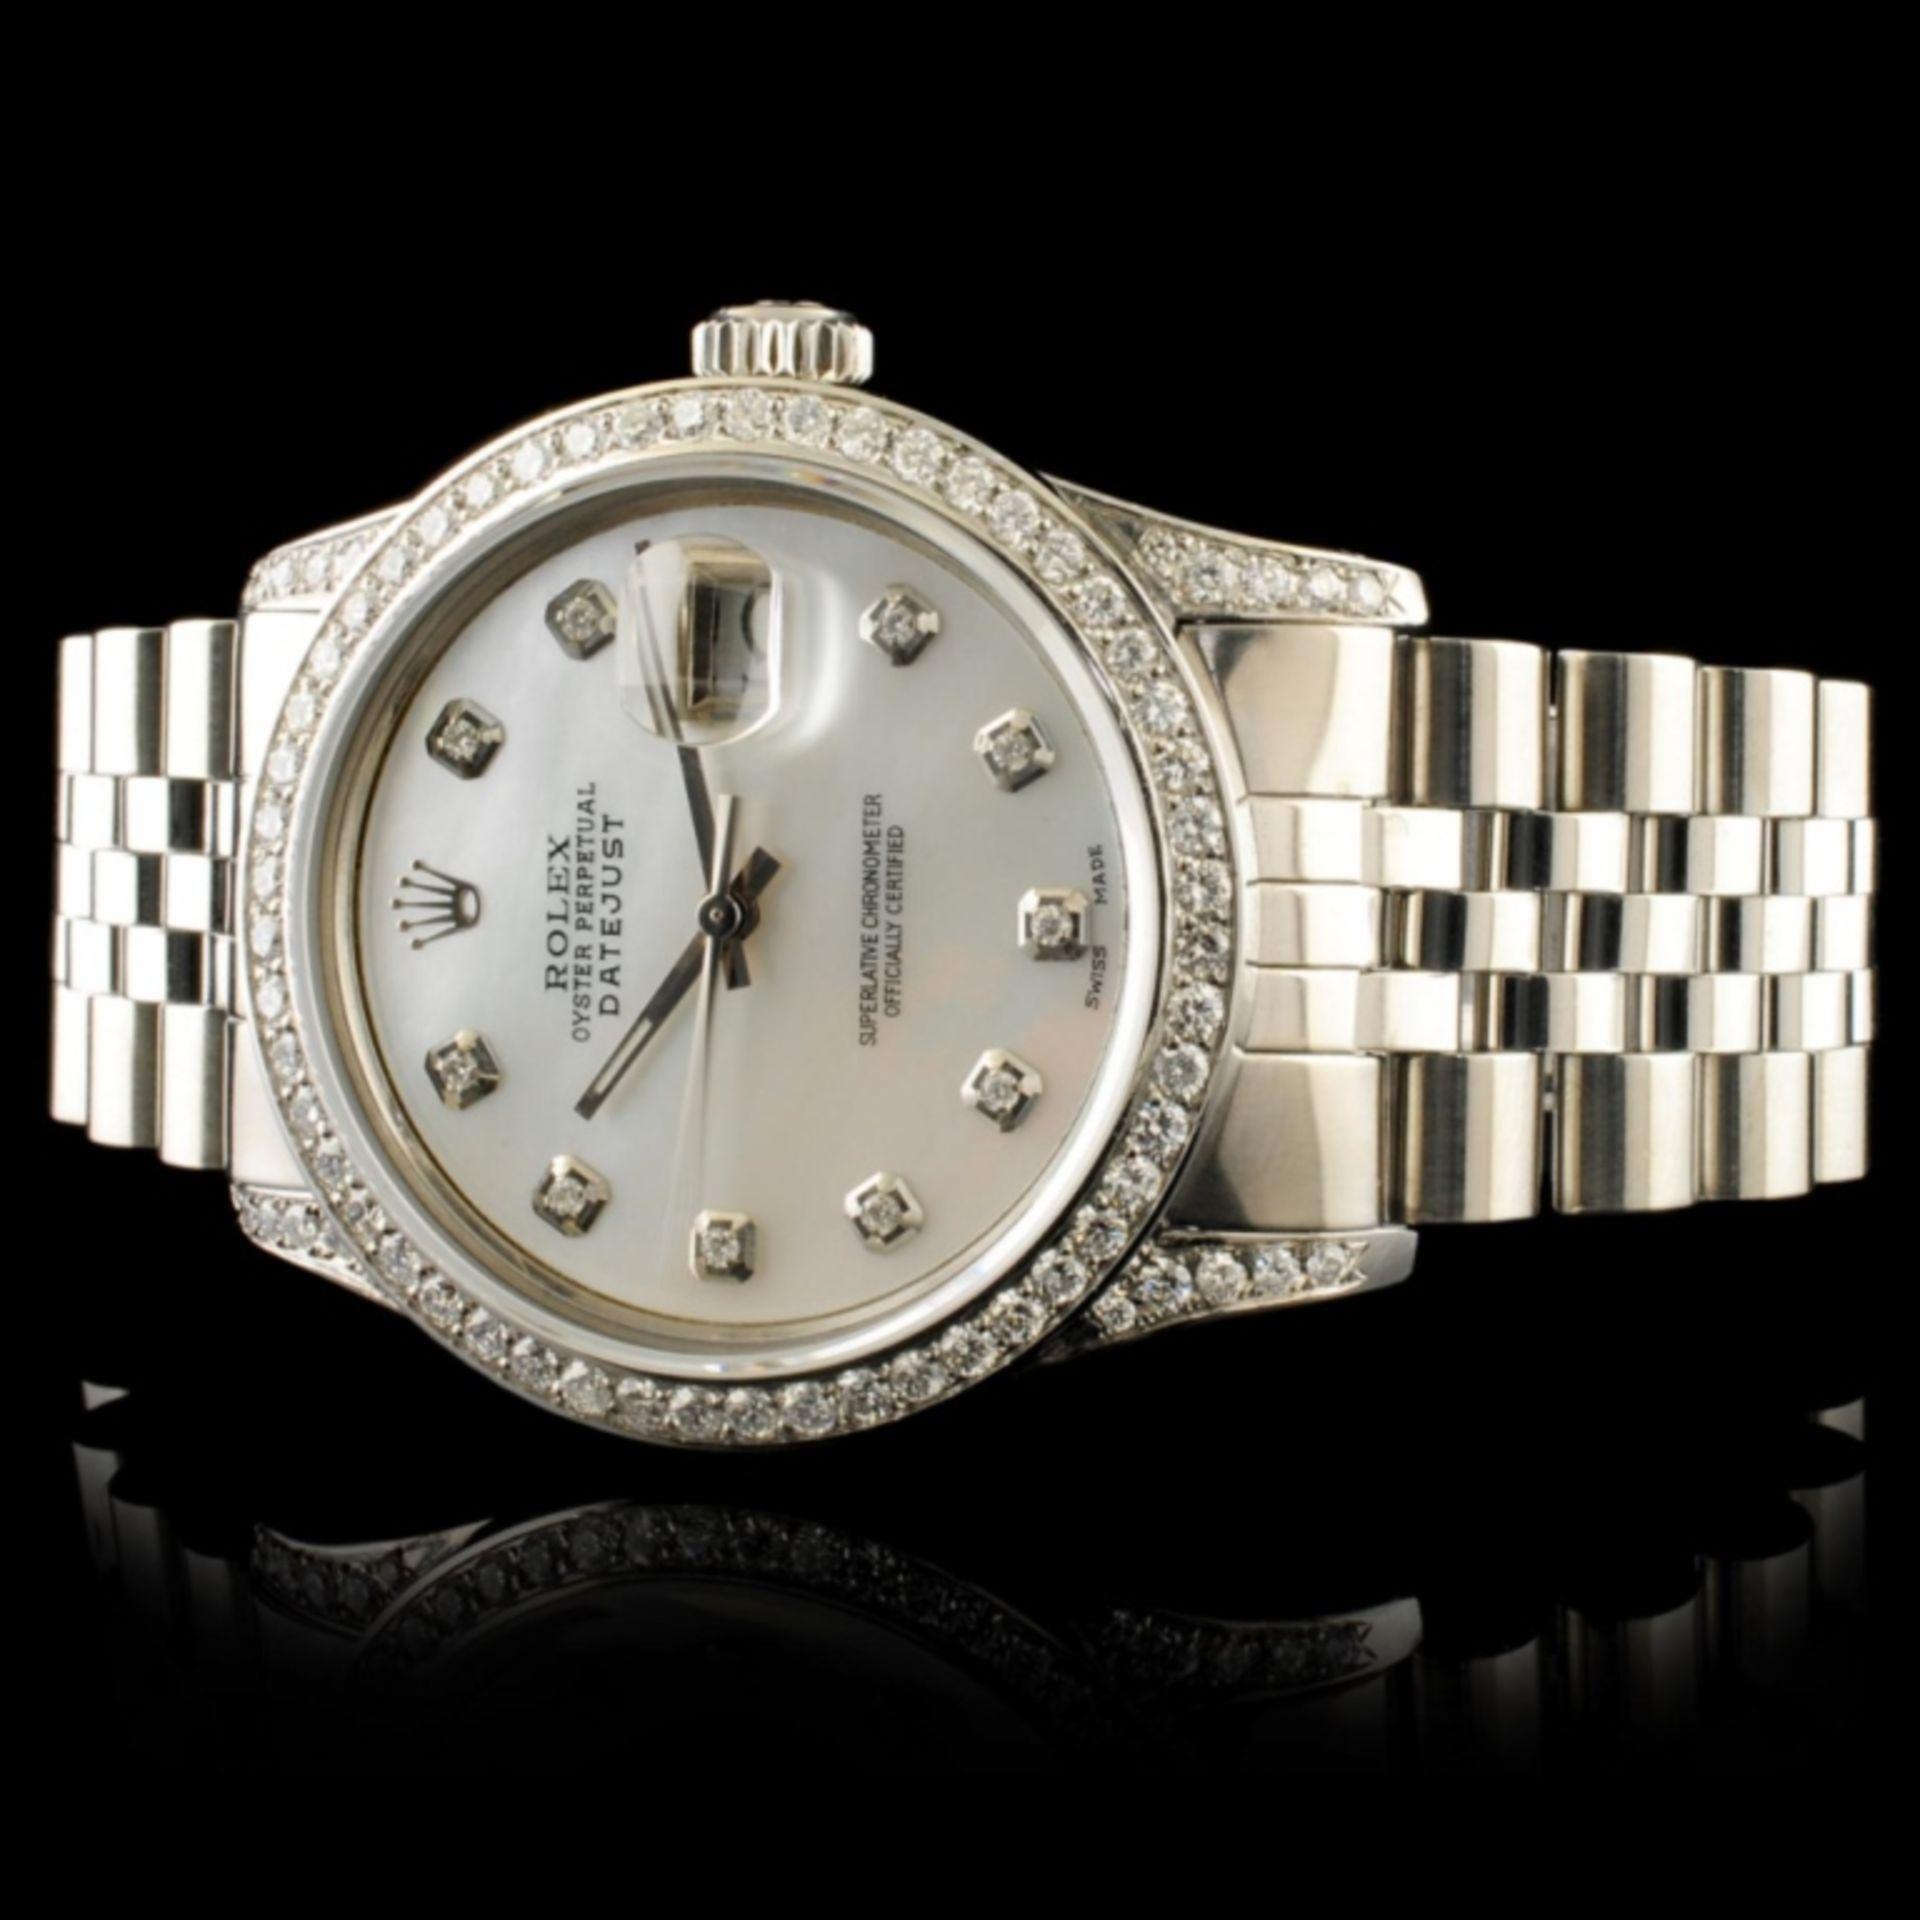 Rolex DateJust 1.50ctw Diamond 36MM Wristwatch - Image 4 of 6